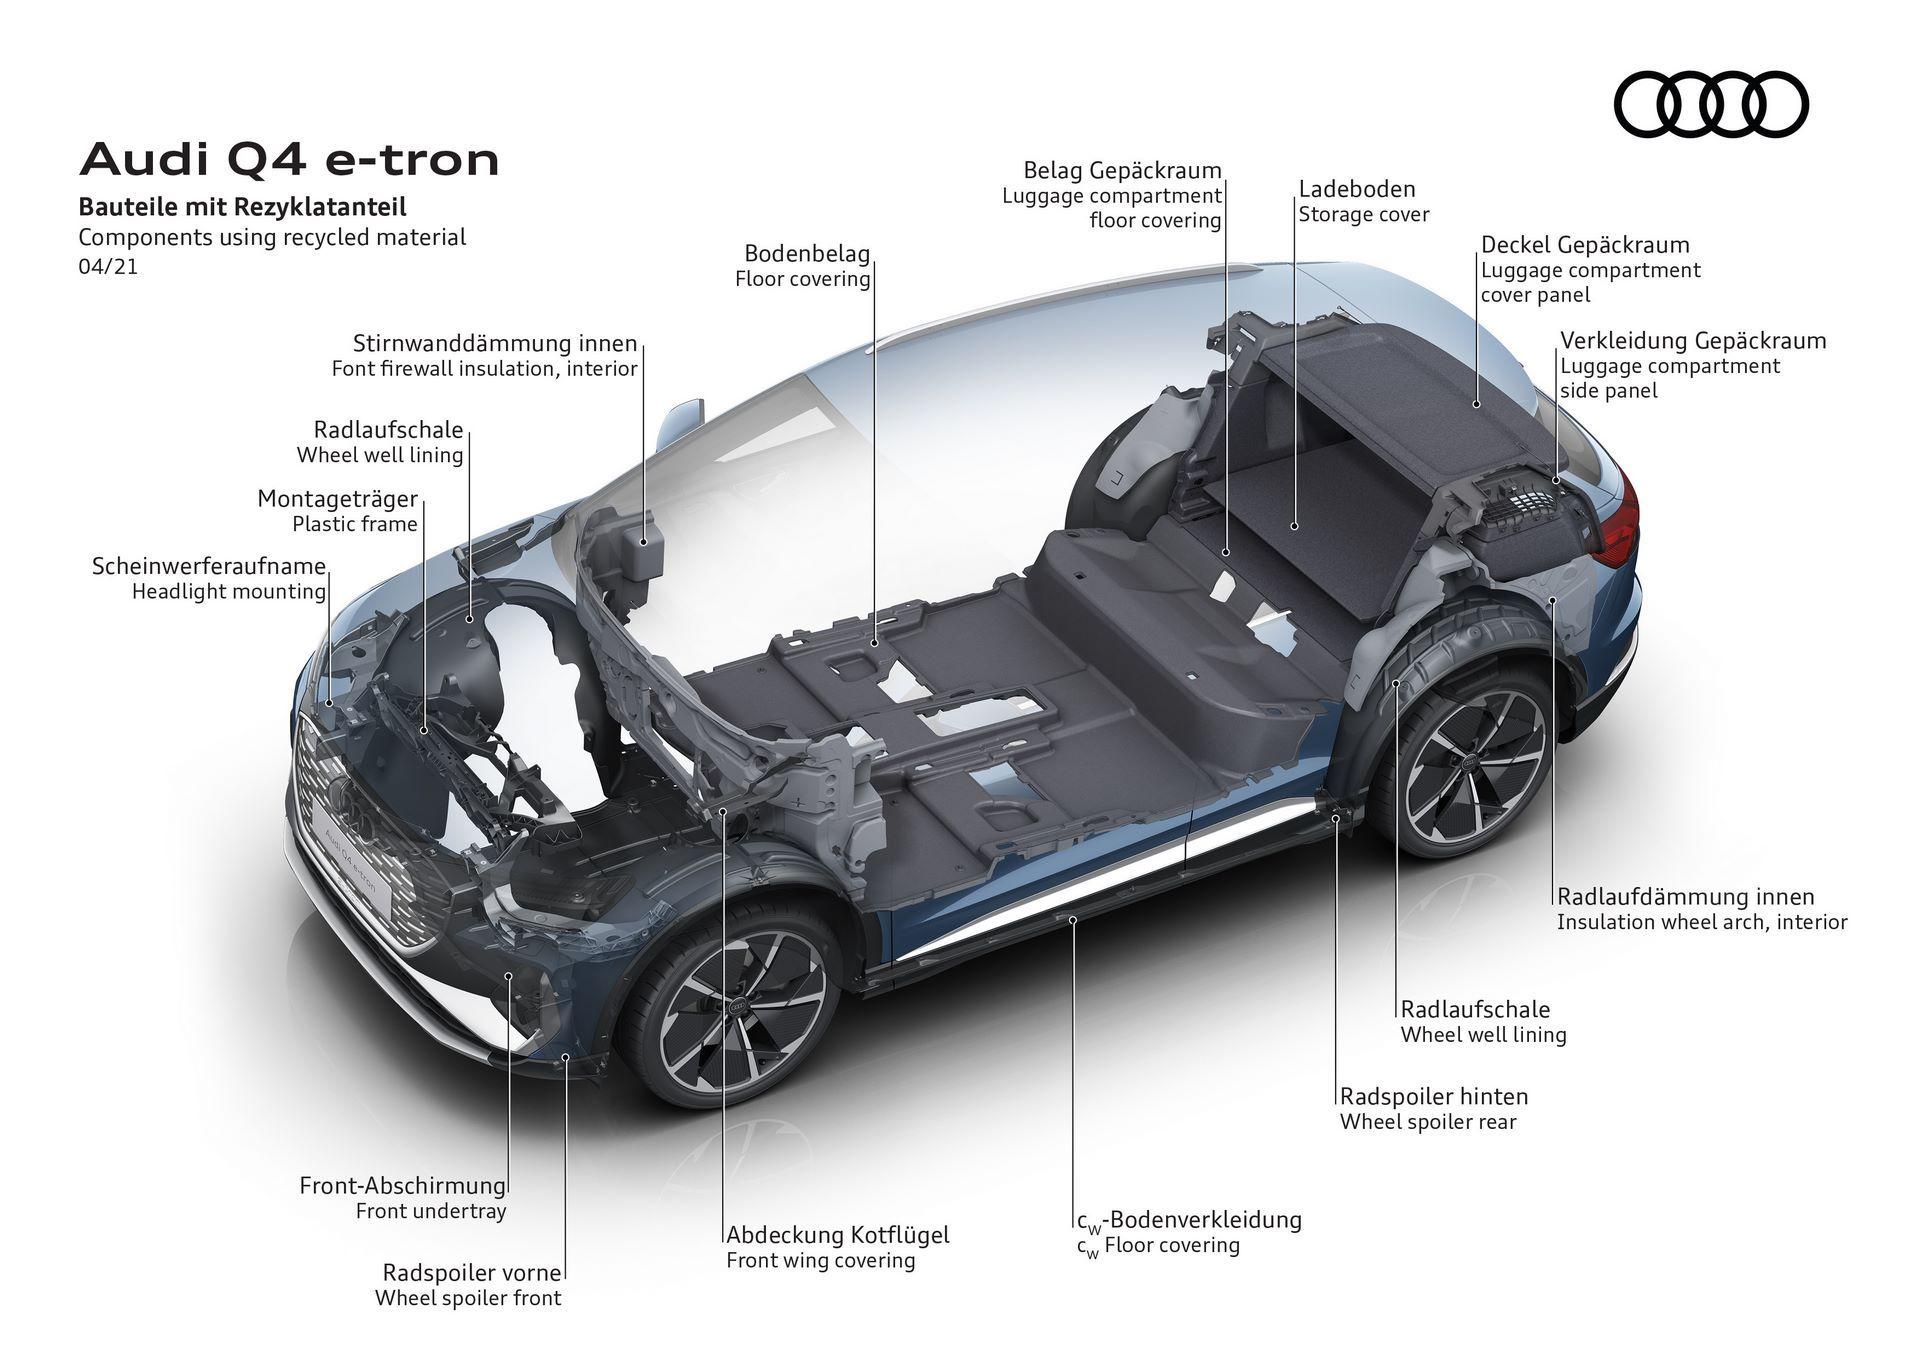 Audi-Q4-e-tron-and-Q4-e-tron-Sportback-99